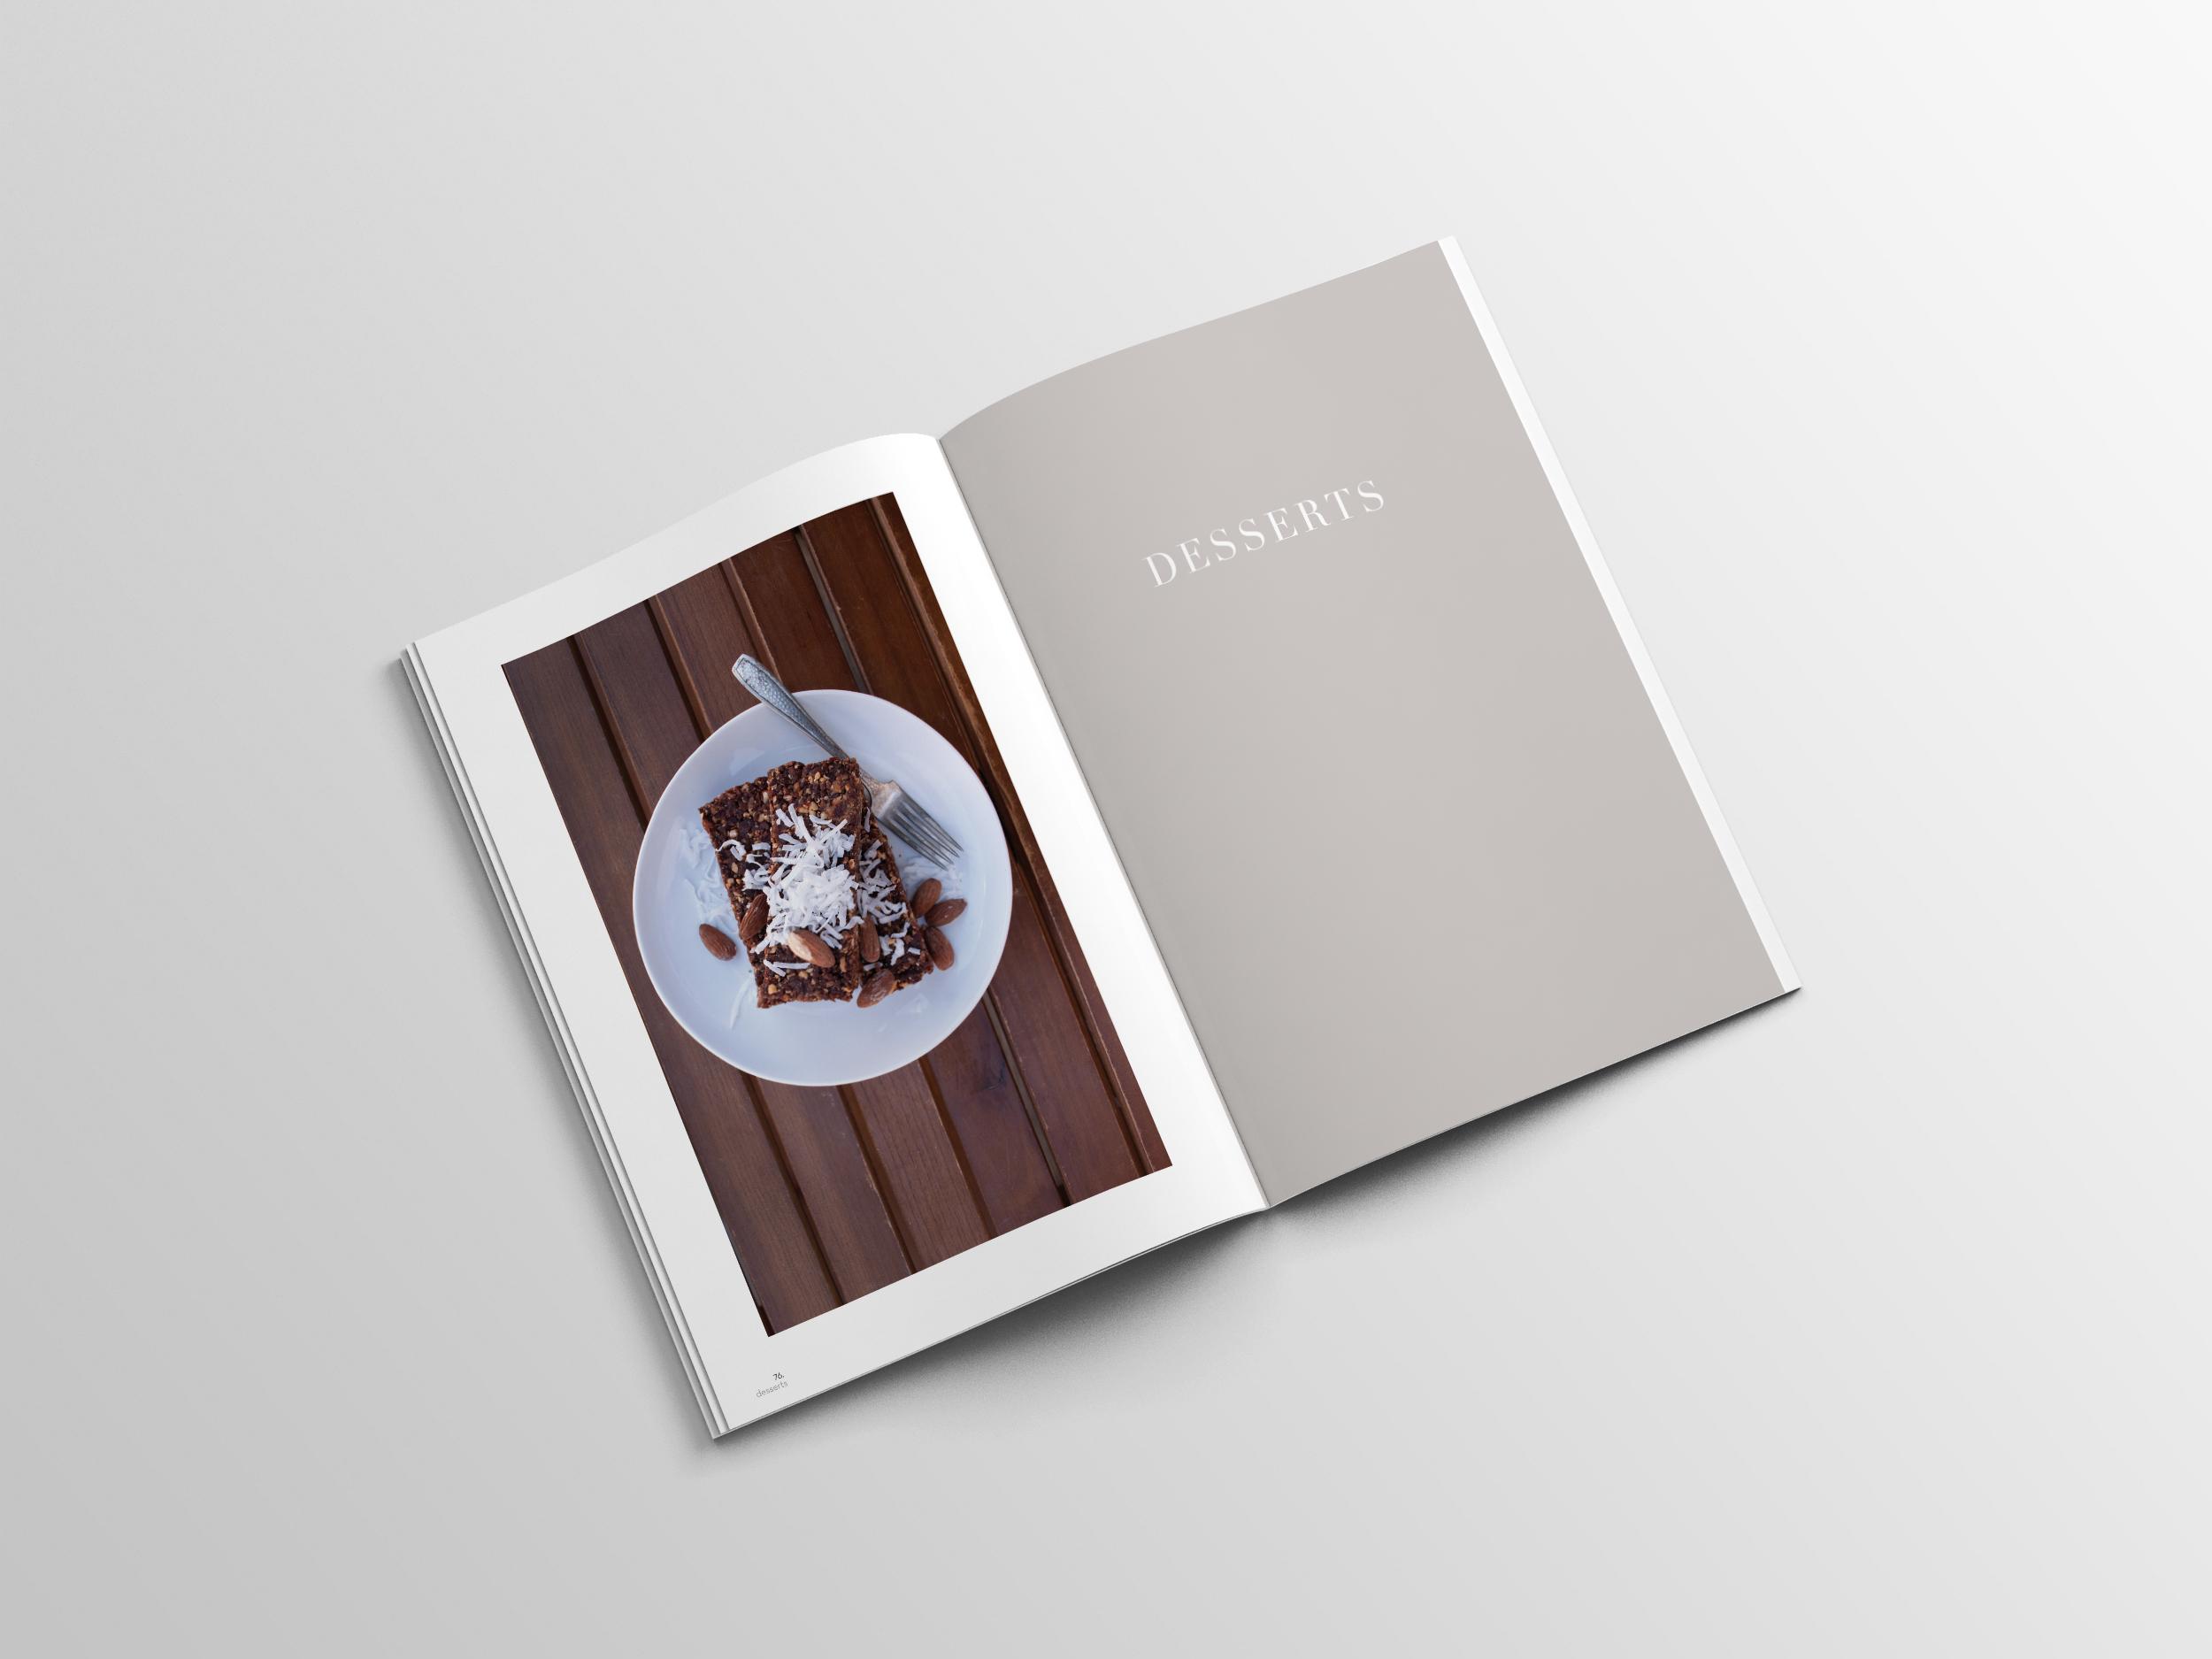 Myriad_mockups_dessertsdiv.jpg